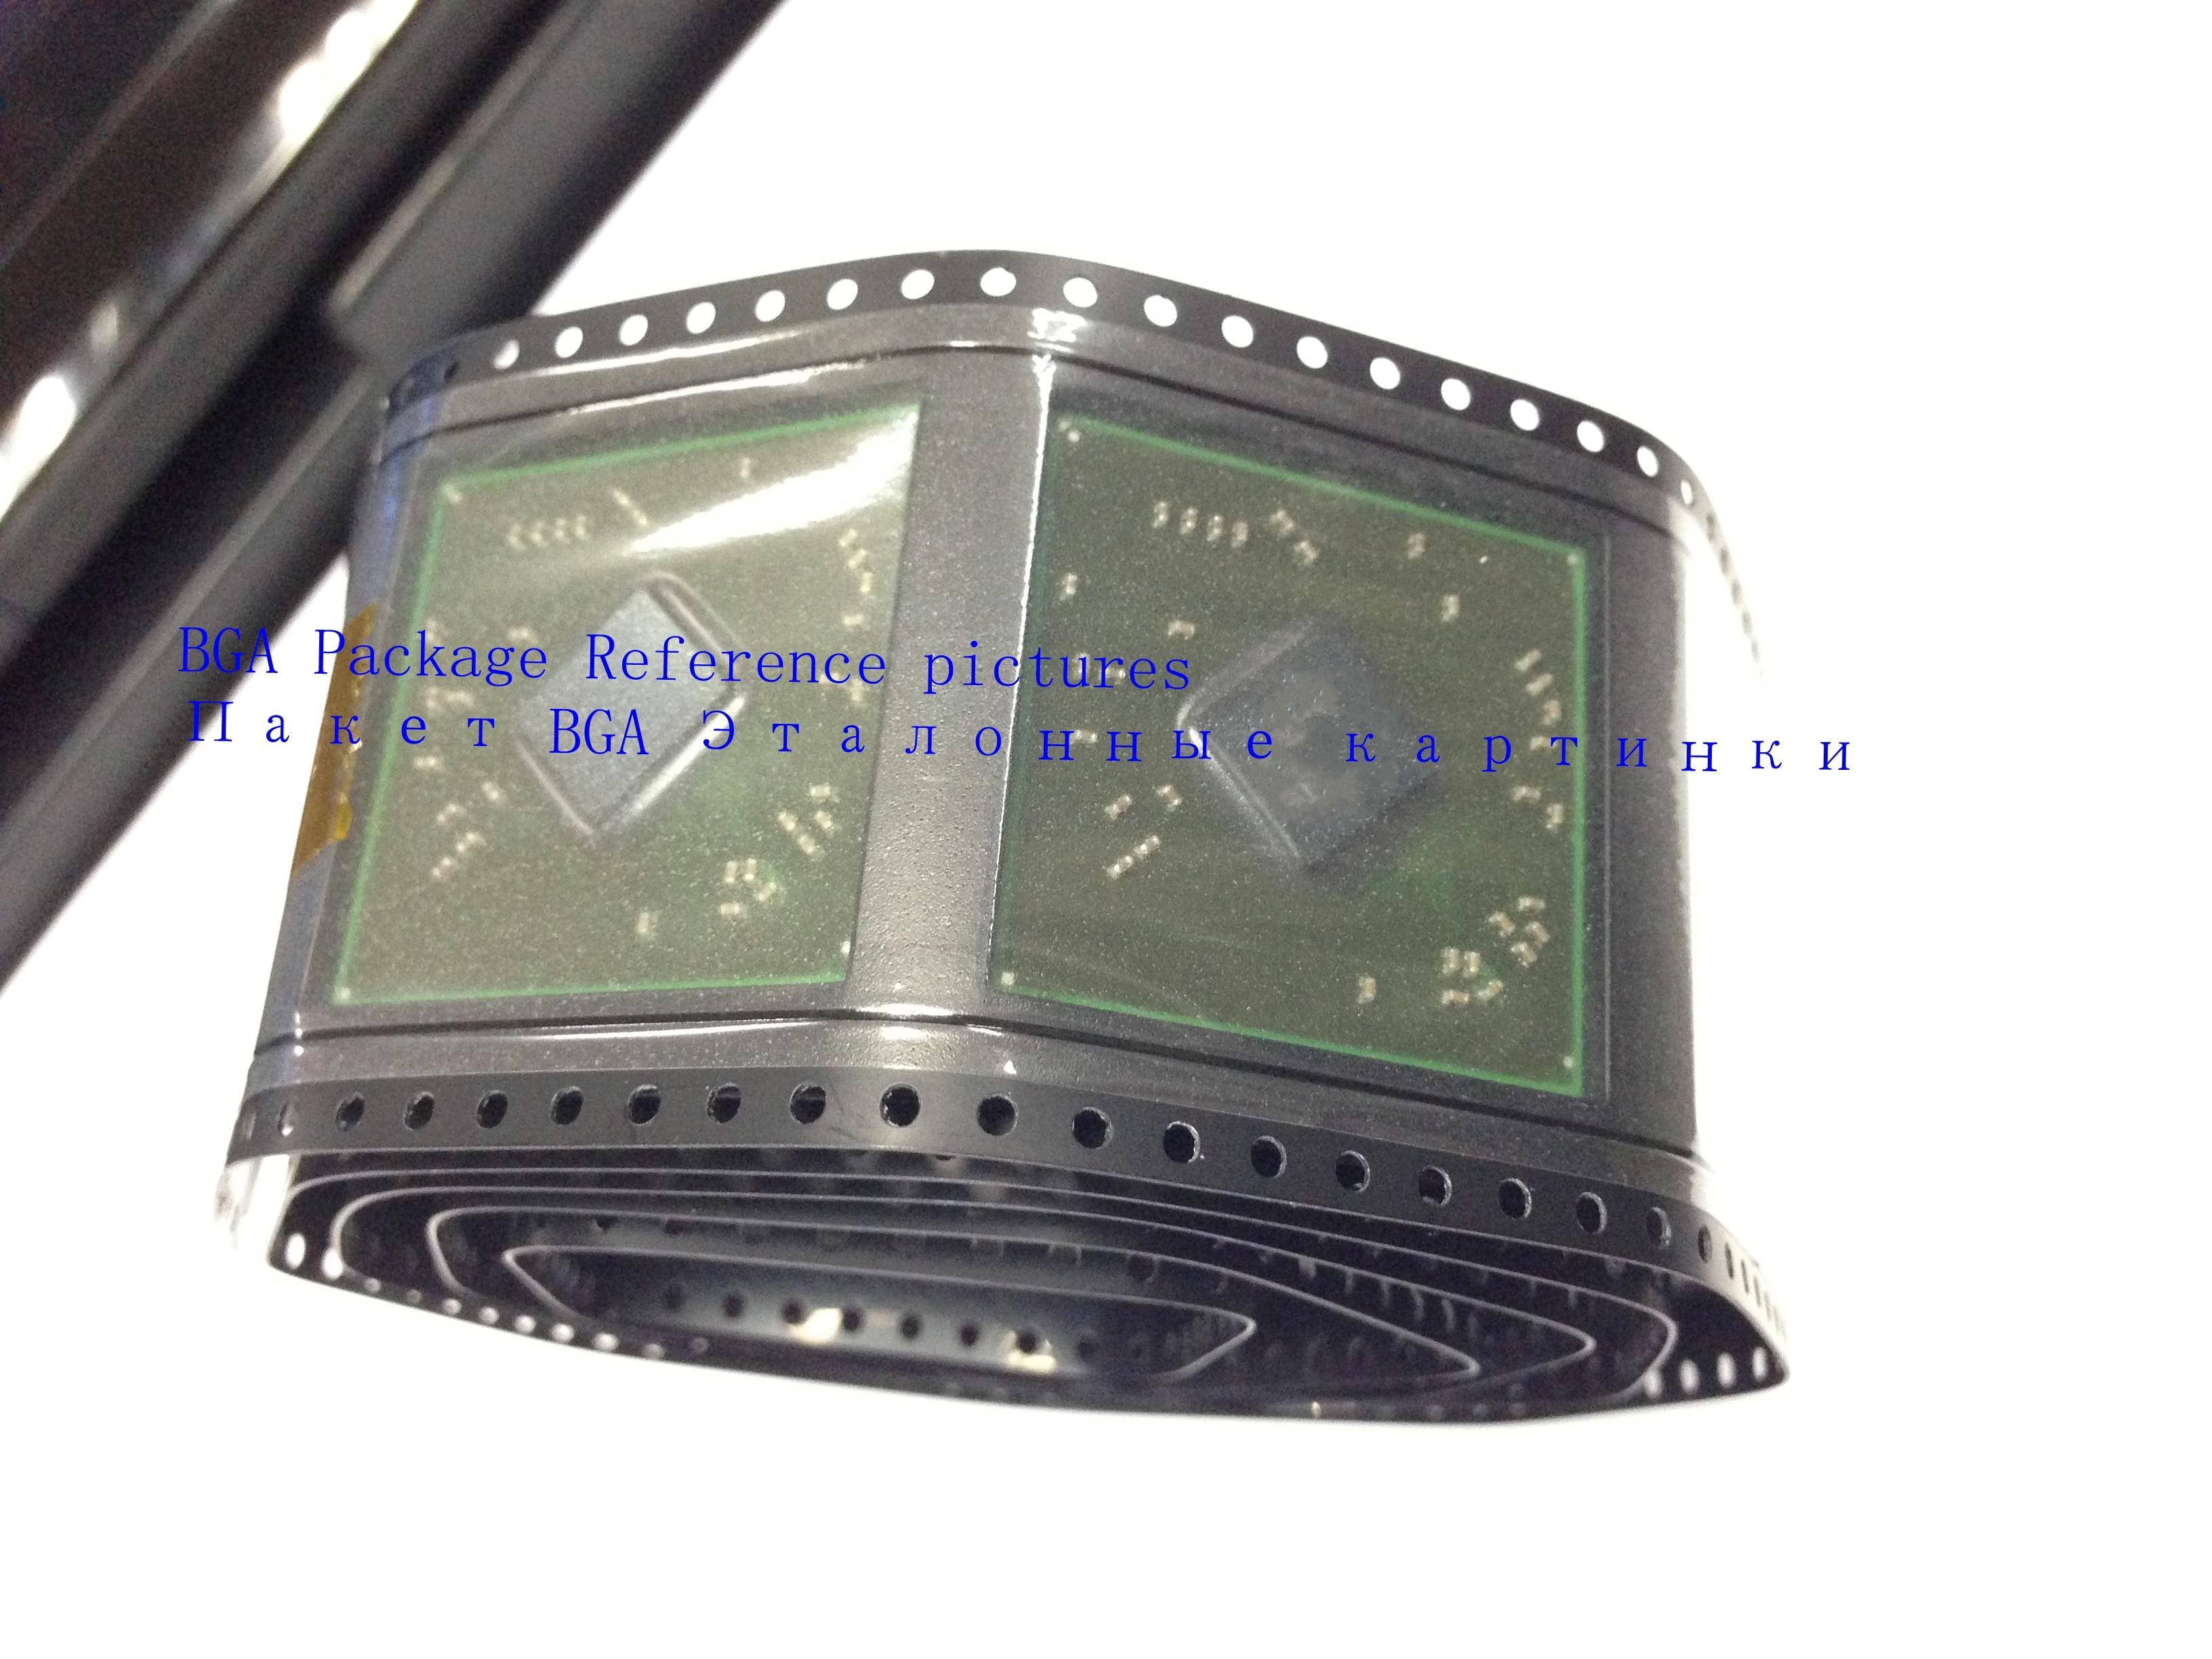 1pcs/lot 100% New QD-NVS-110MT-N-A3 QD NVS 110MT N A3 BGA Chipset1pcs/lot 100% New QD-NVS-110MT-N-A3 QD NVS 110MT N A3 BGA Chipset